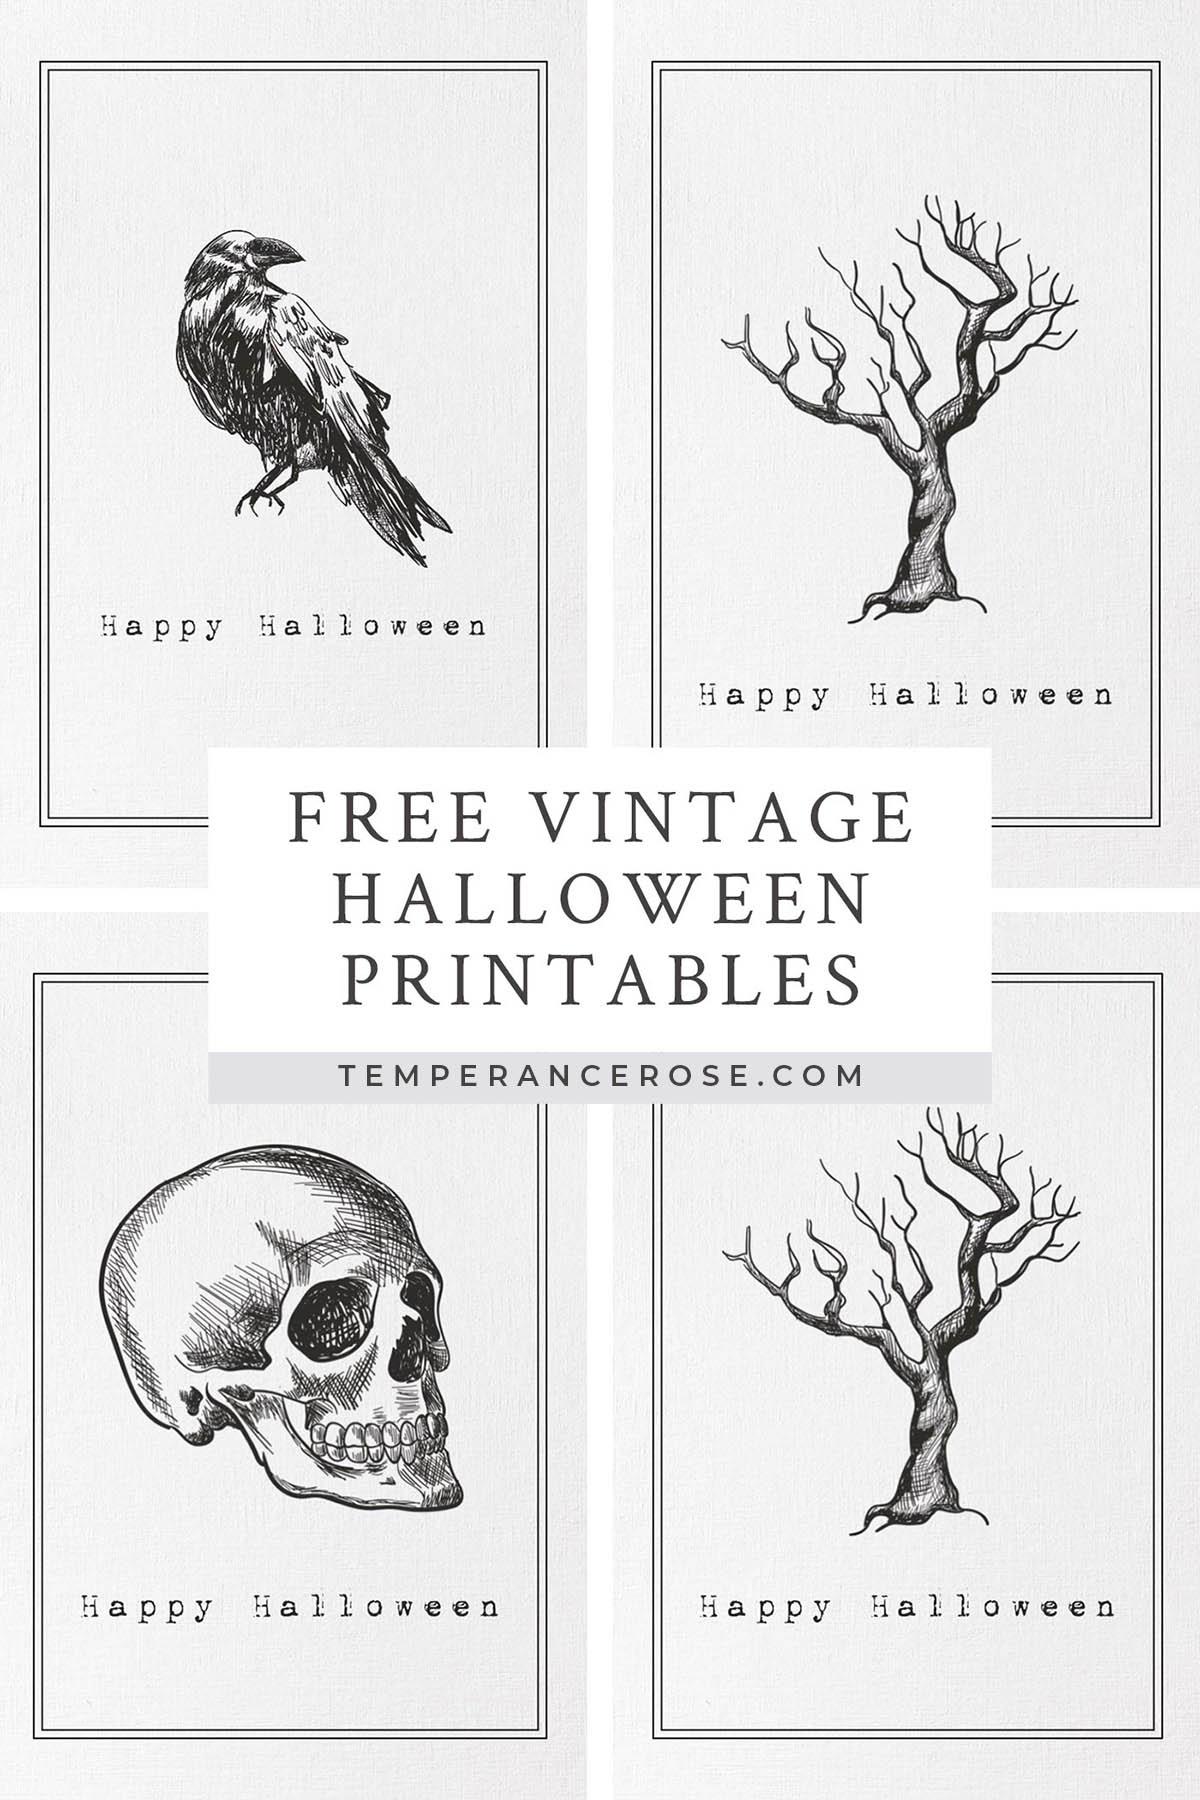 Free Printable Vintage Halloween Wall Art - Free Vintage Halloween Printables